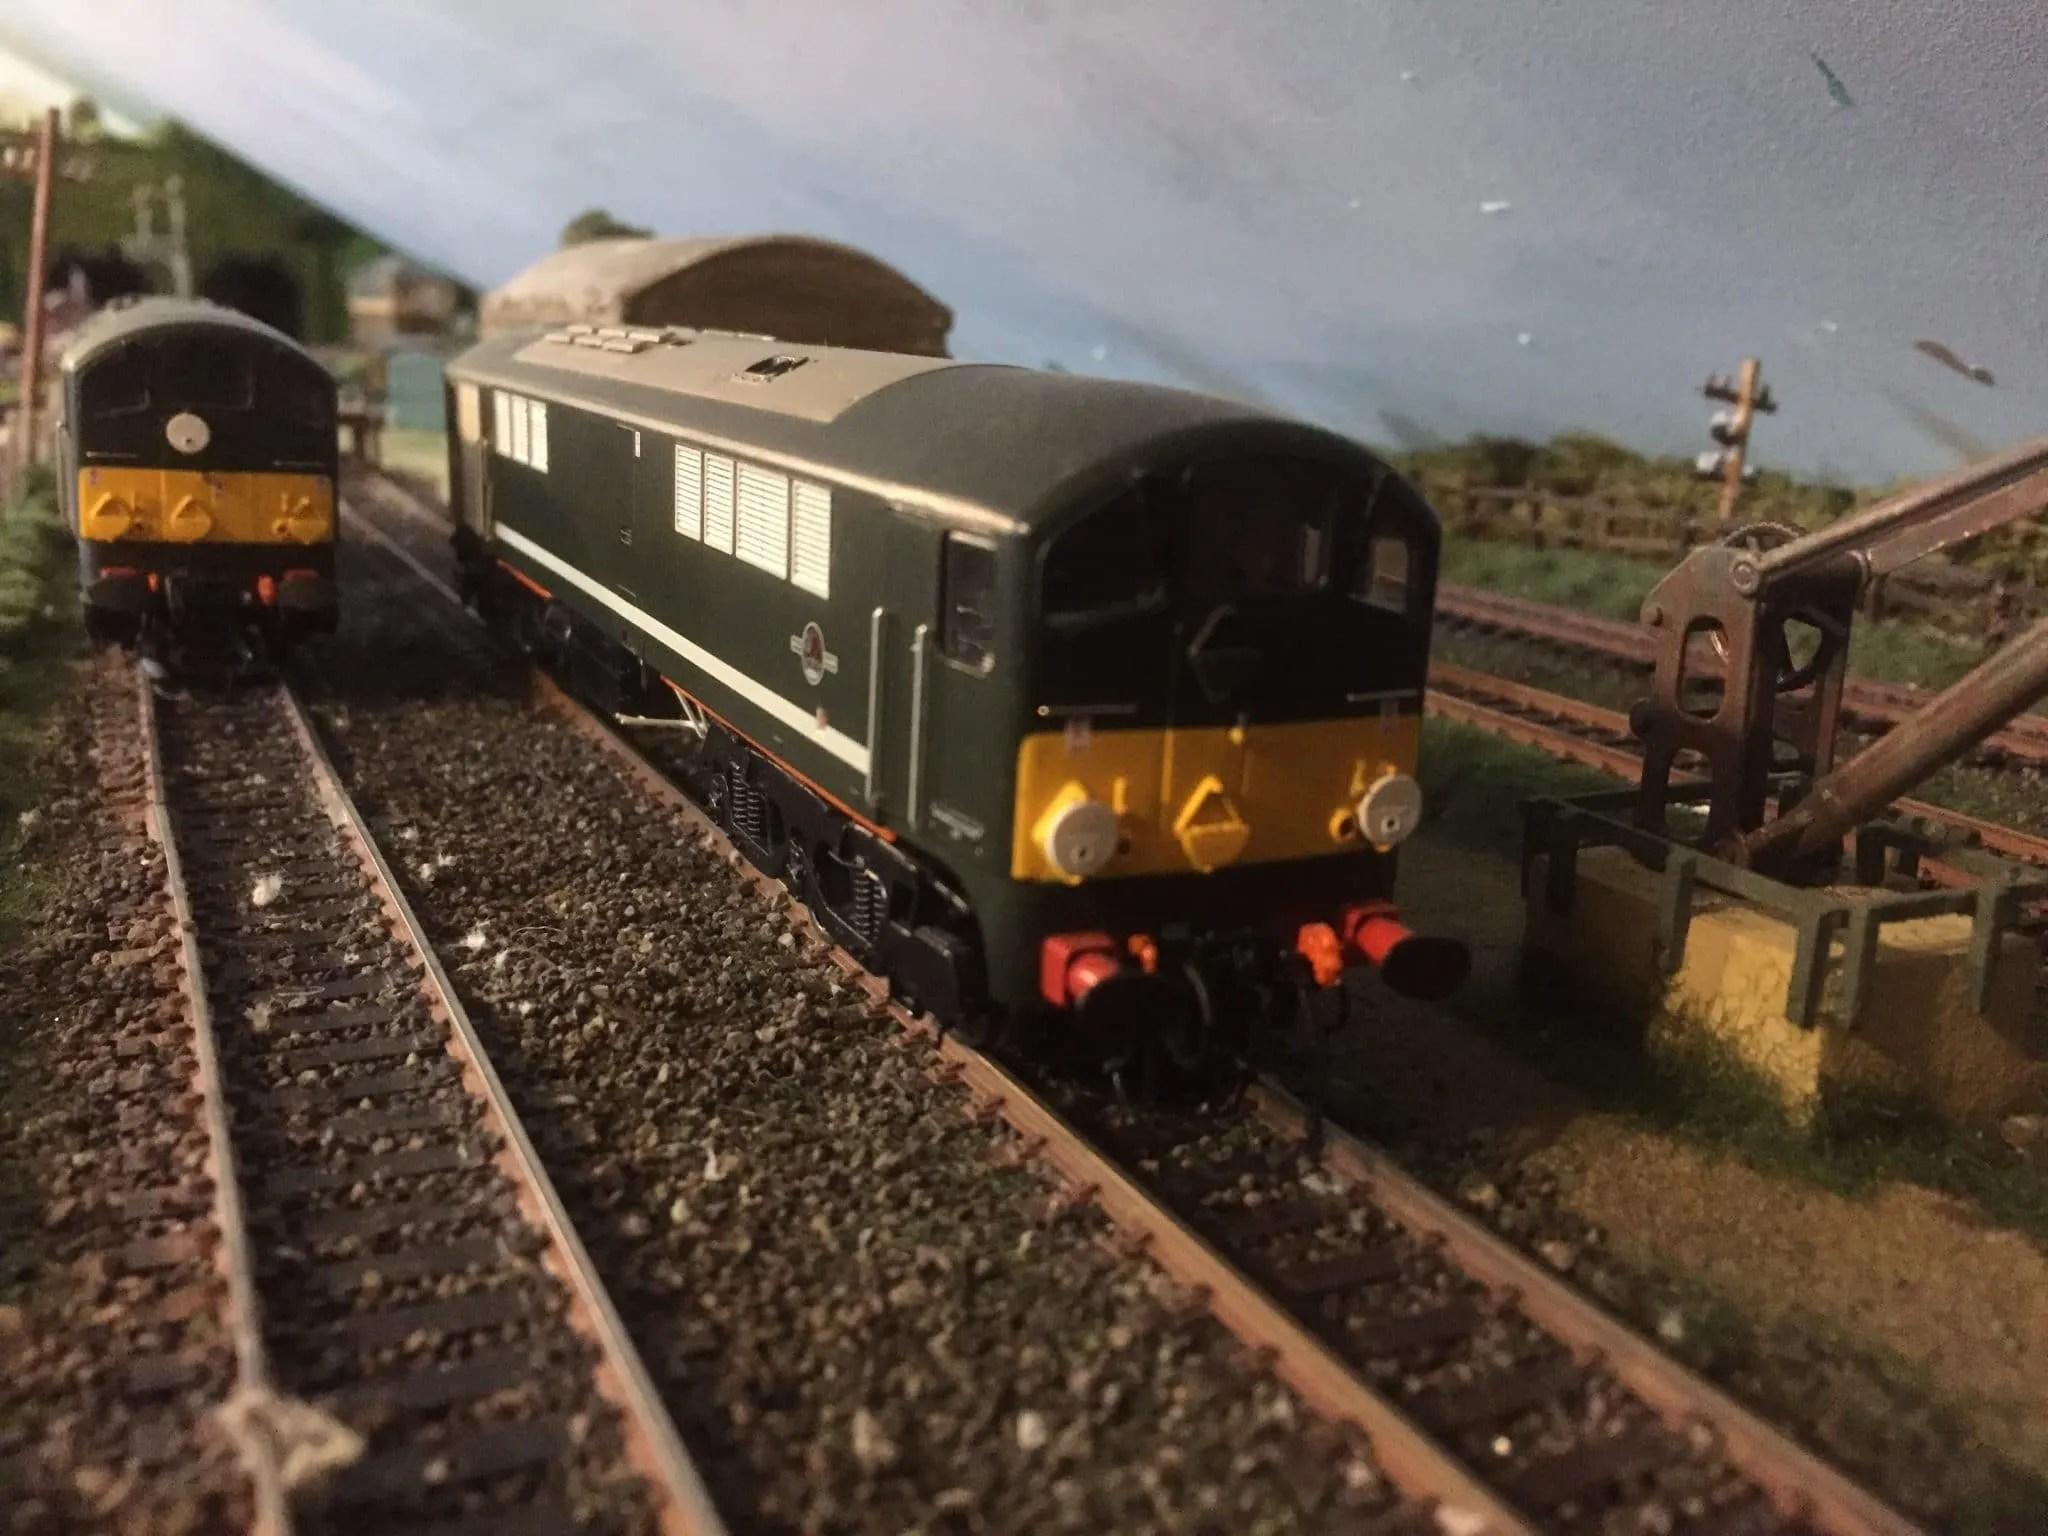 Co-Bo - class 28 - locomotives - model railway